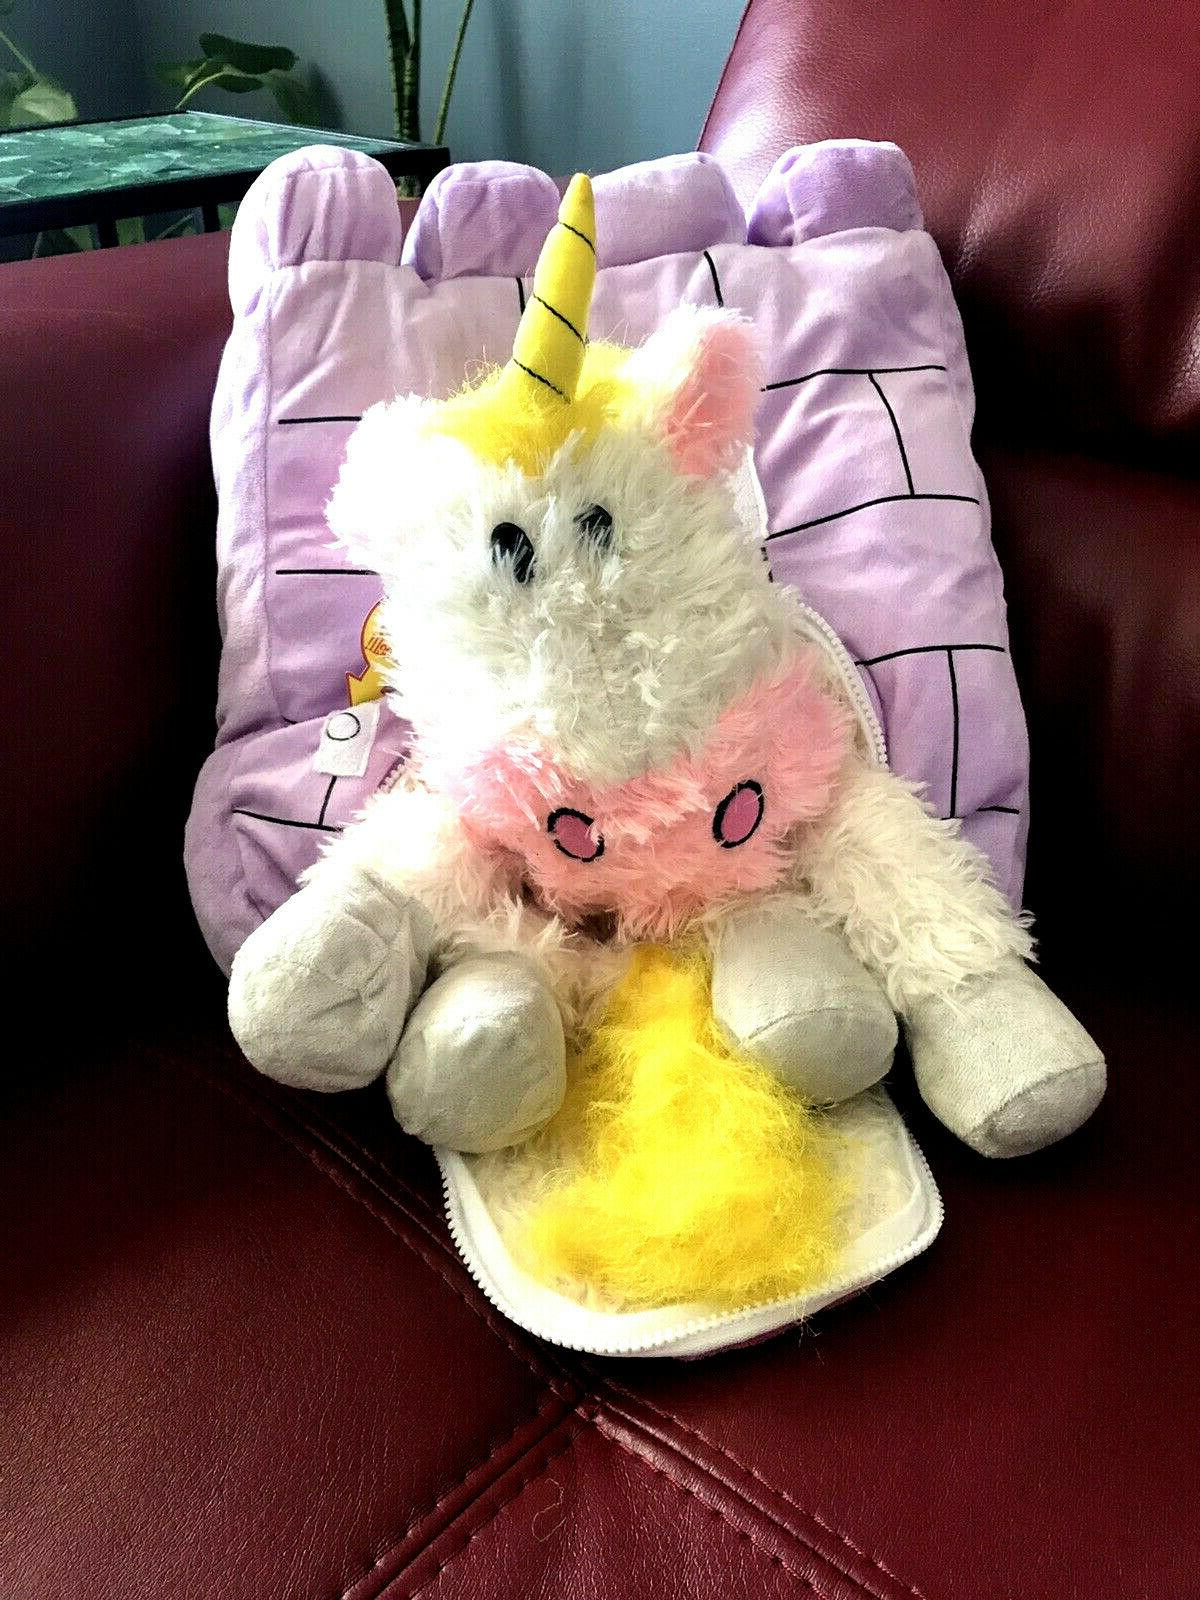 "24"" Funny Stuffed Plush Fantasy Soft Pillow"